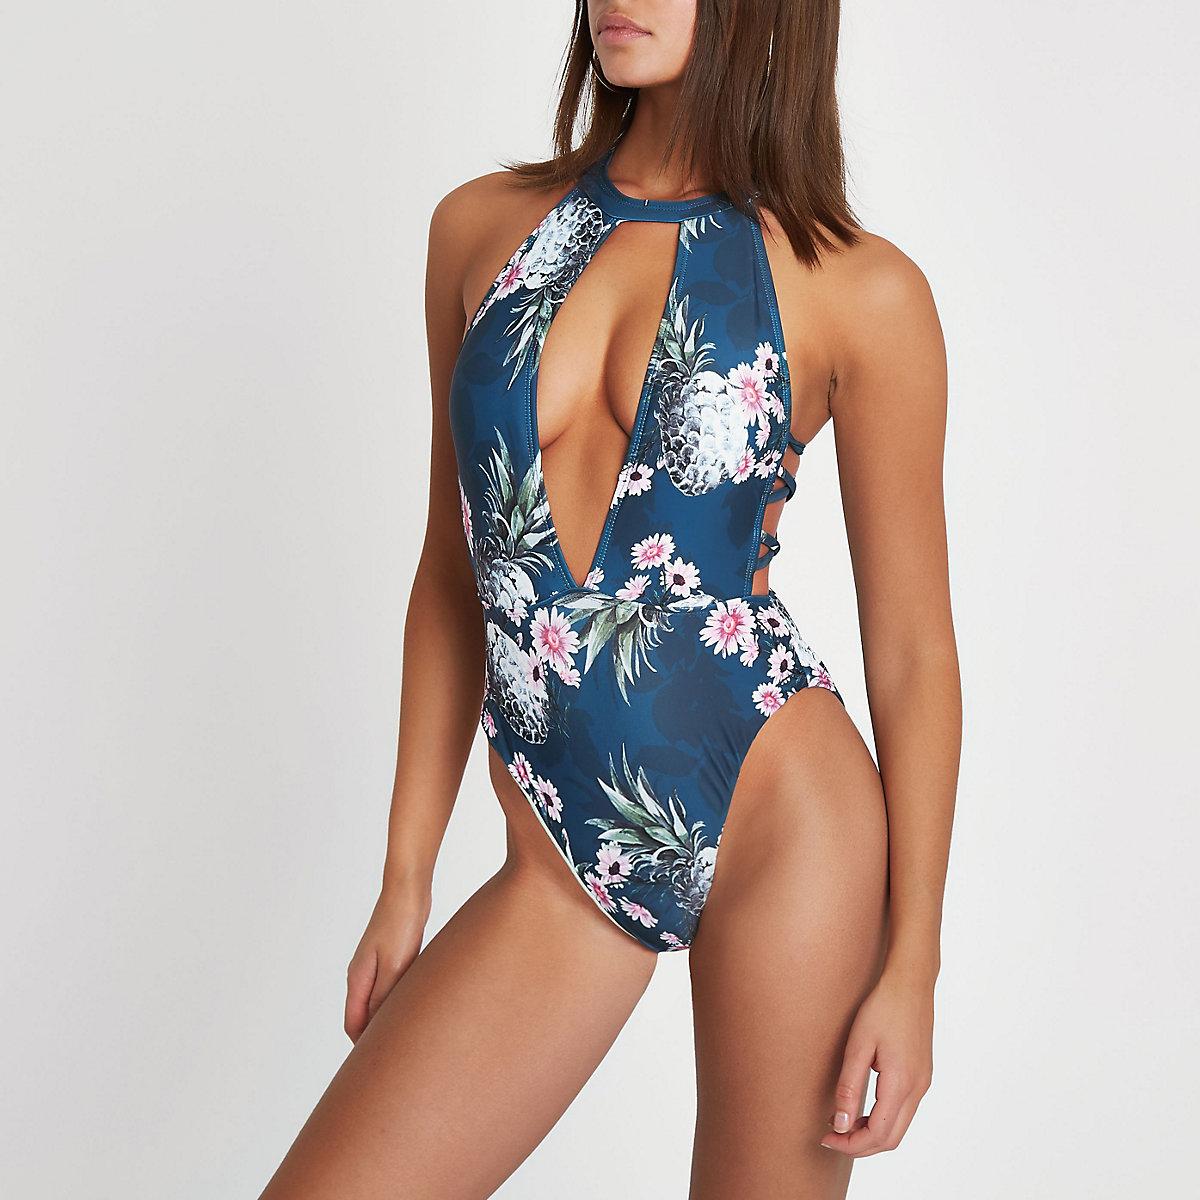 6b0e04e857 Navy floral print high neck cut out swimsuit - Swimsuits - Swimwear    Beachwear - women